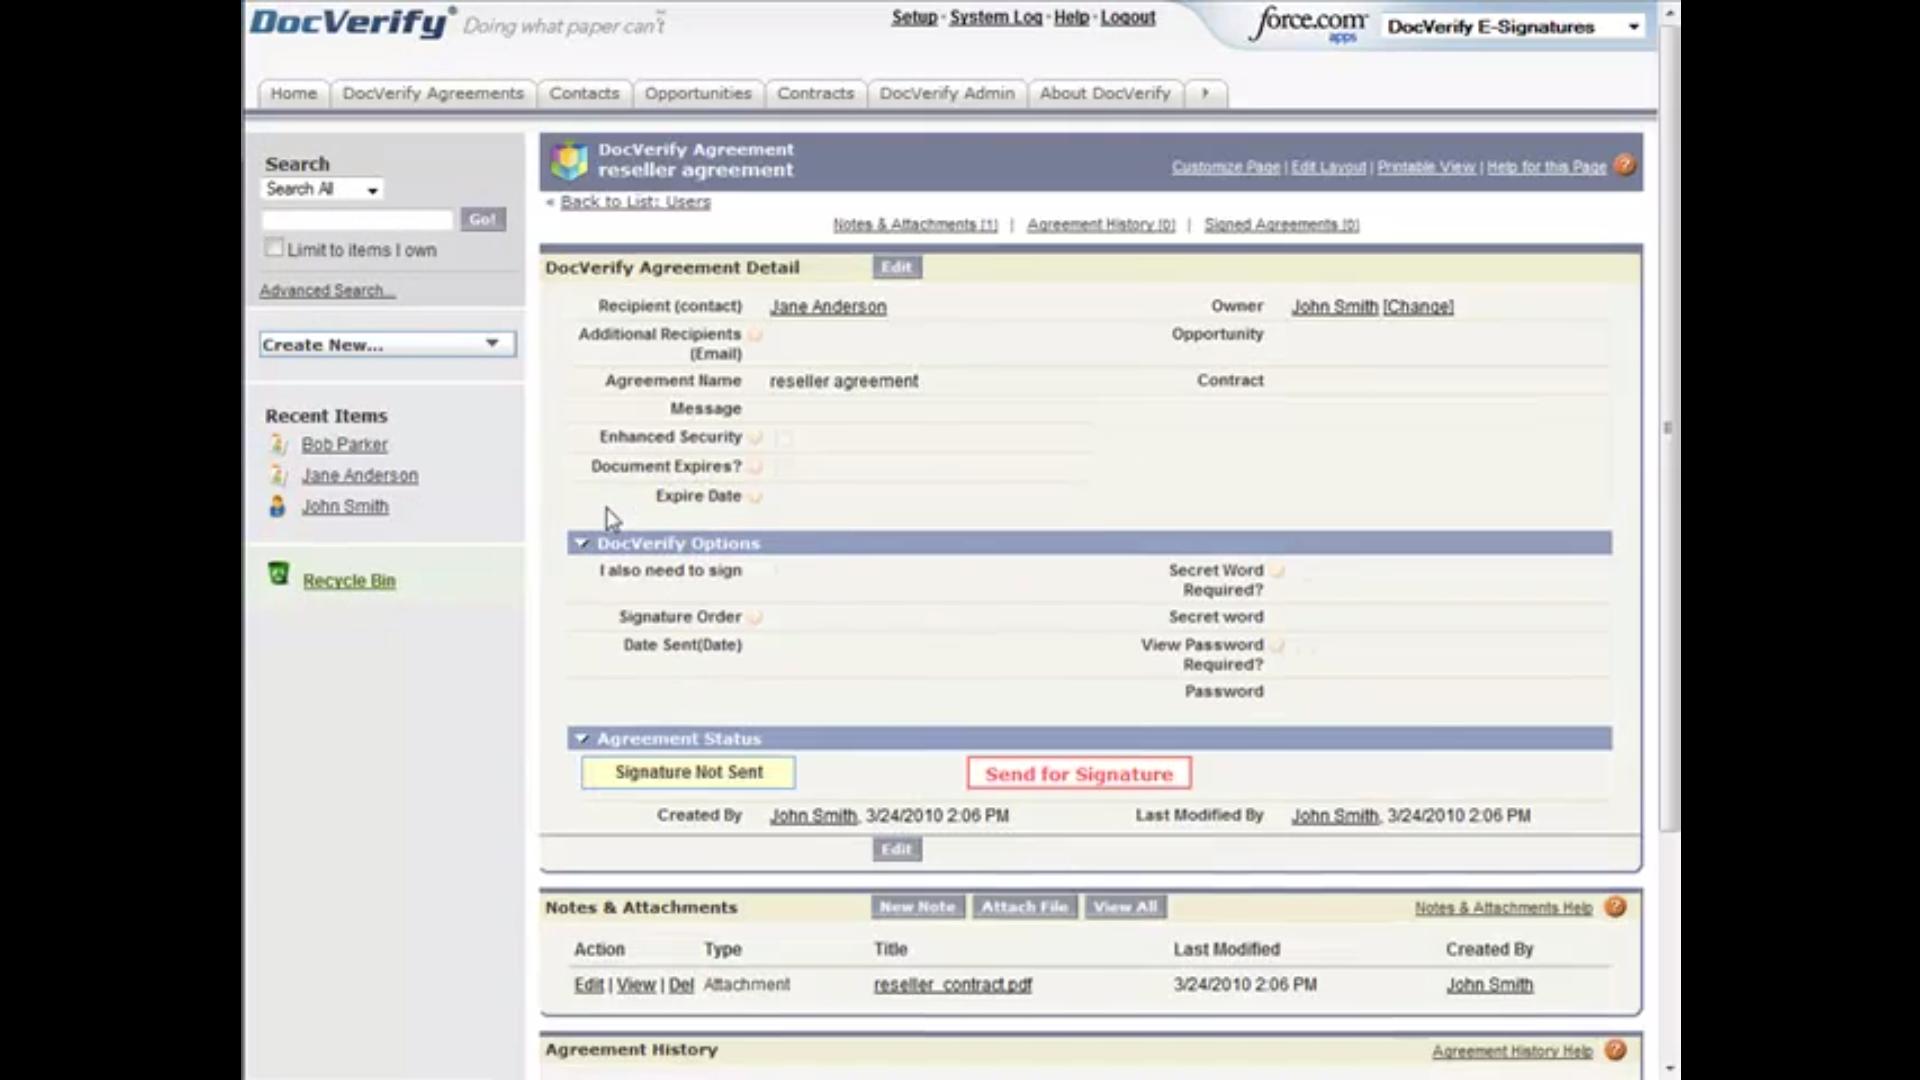 DocVerify agreement detail